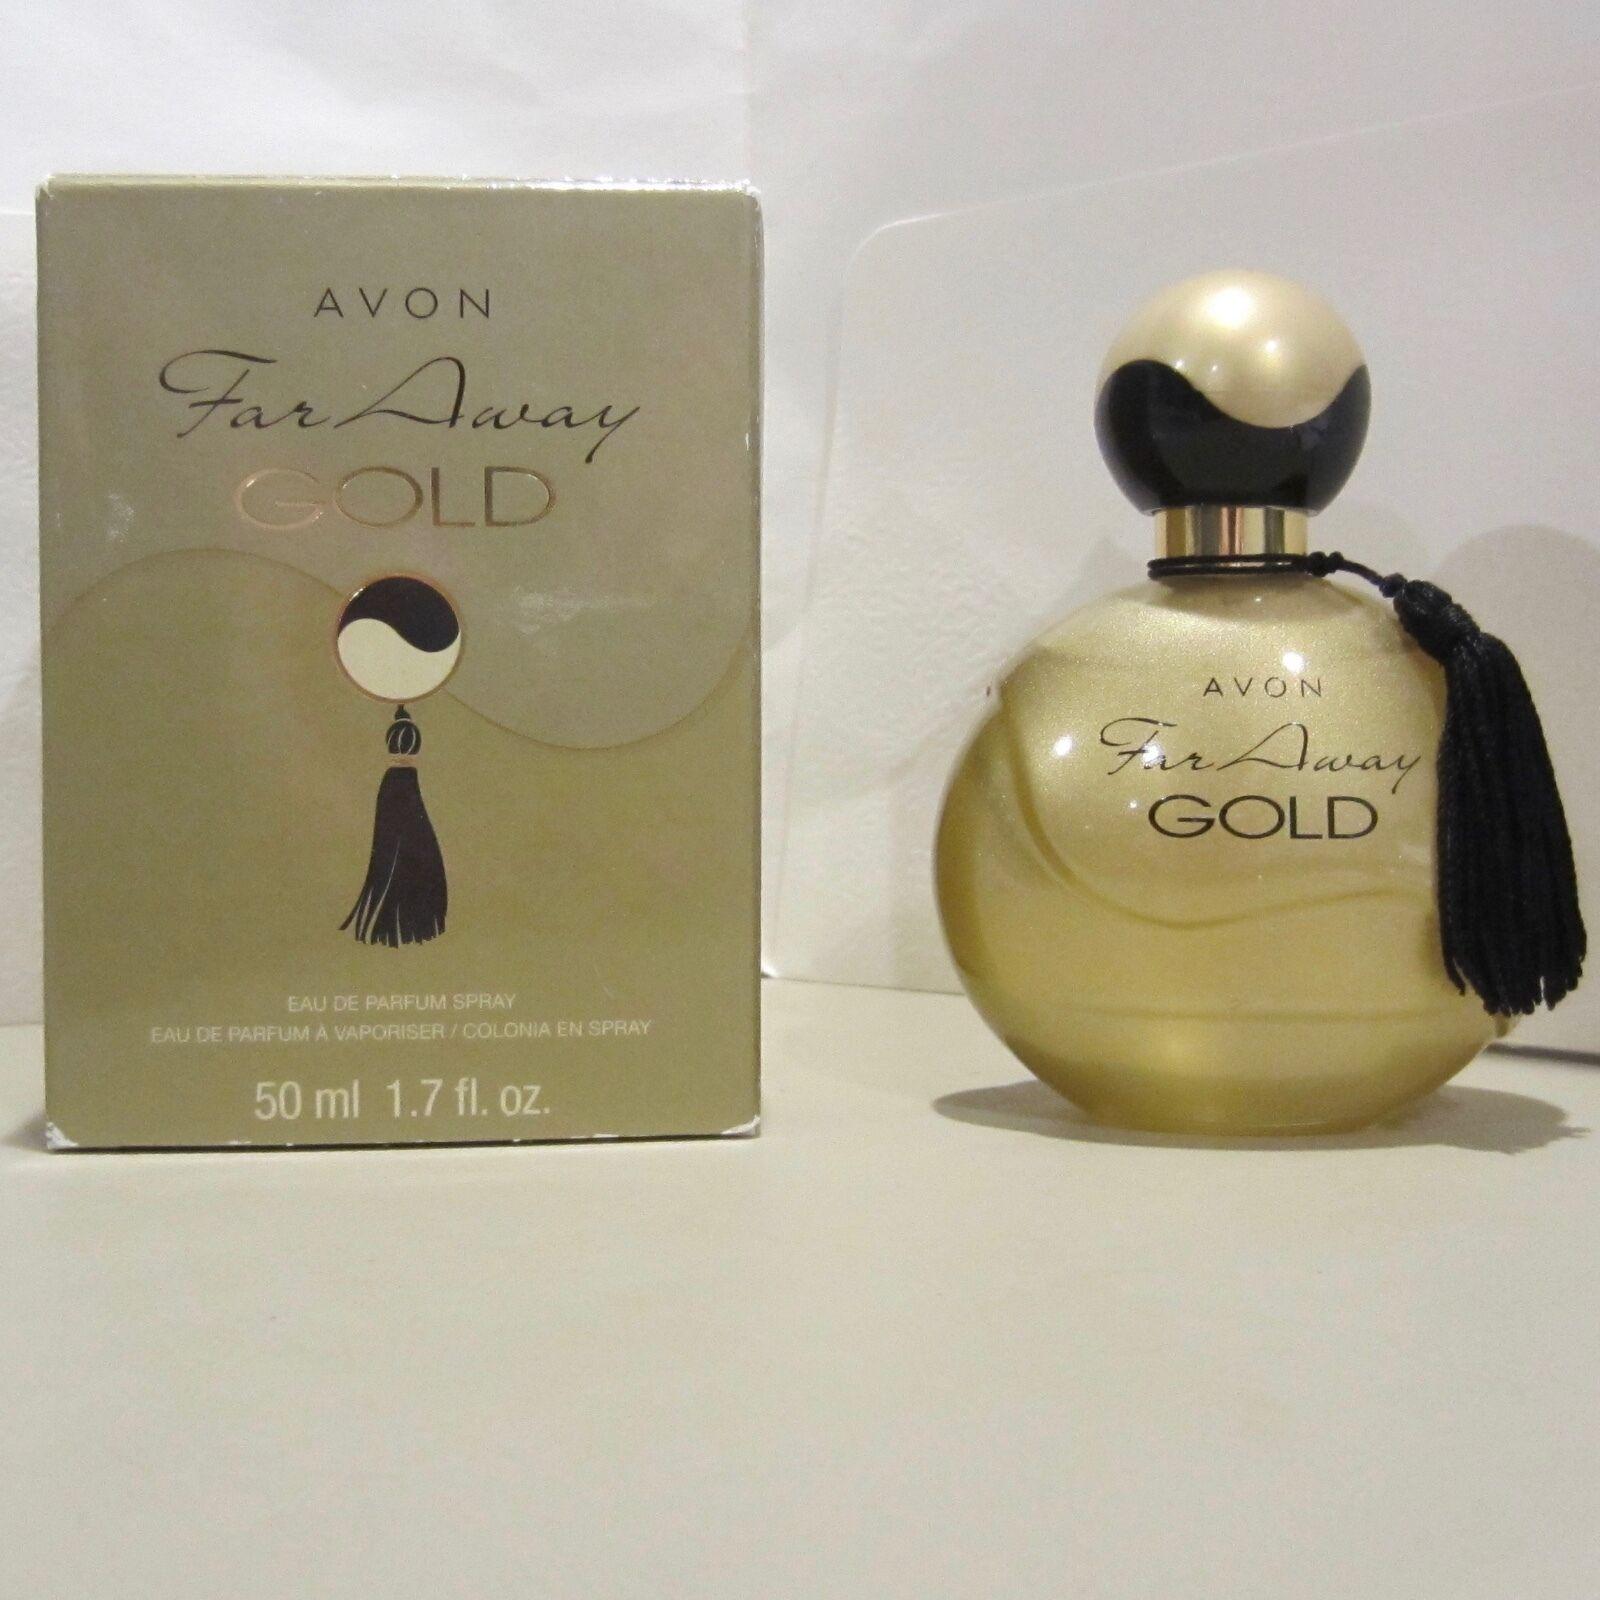 FAR AWAY GOLD PERFUME BY AVON - $6.99